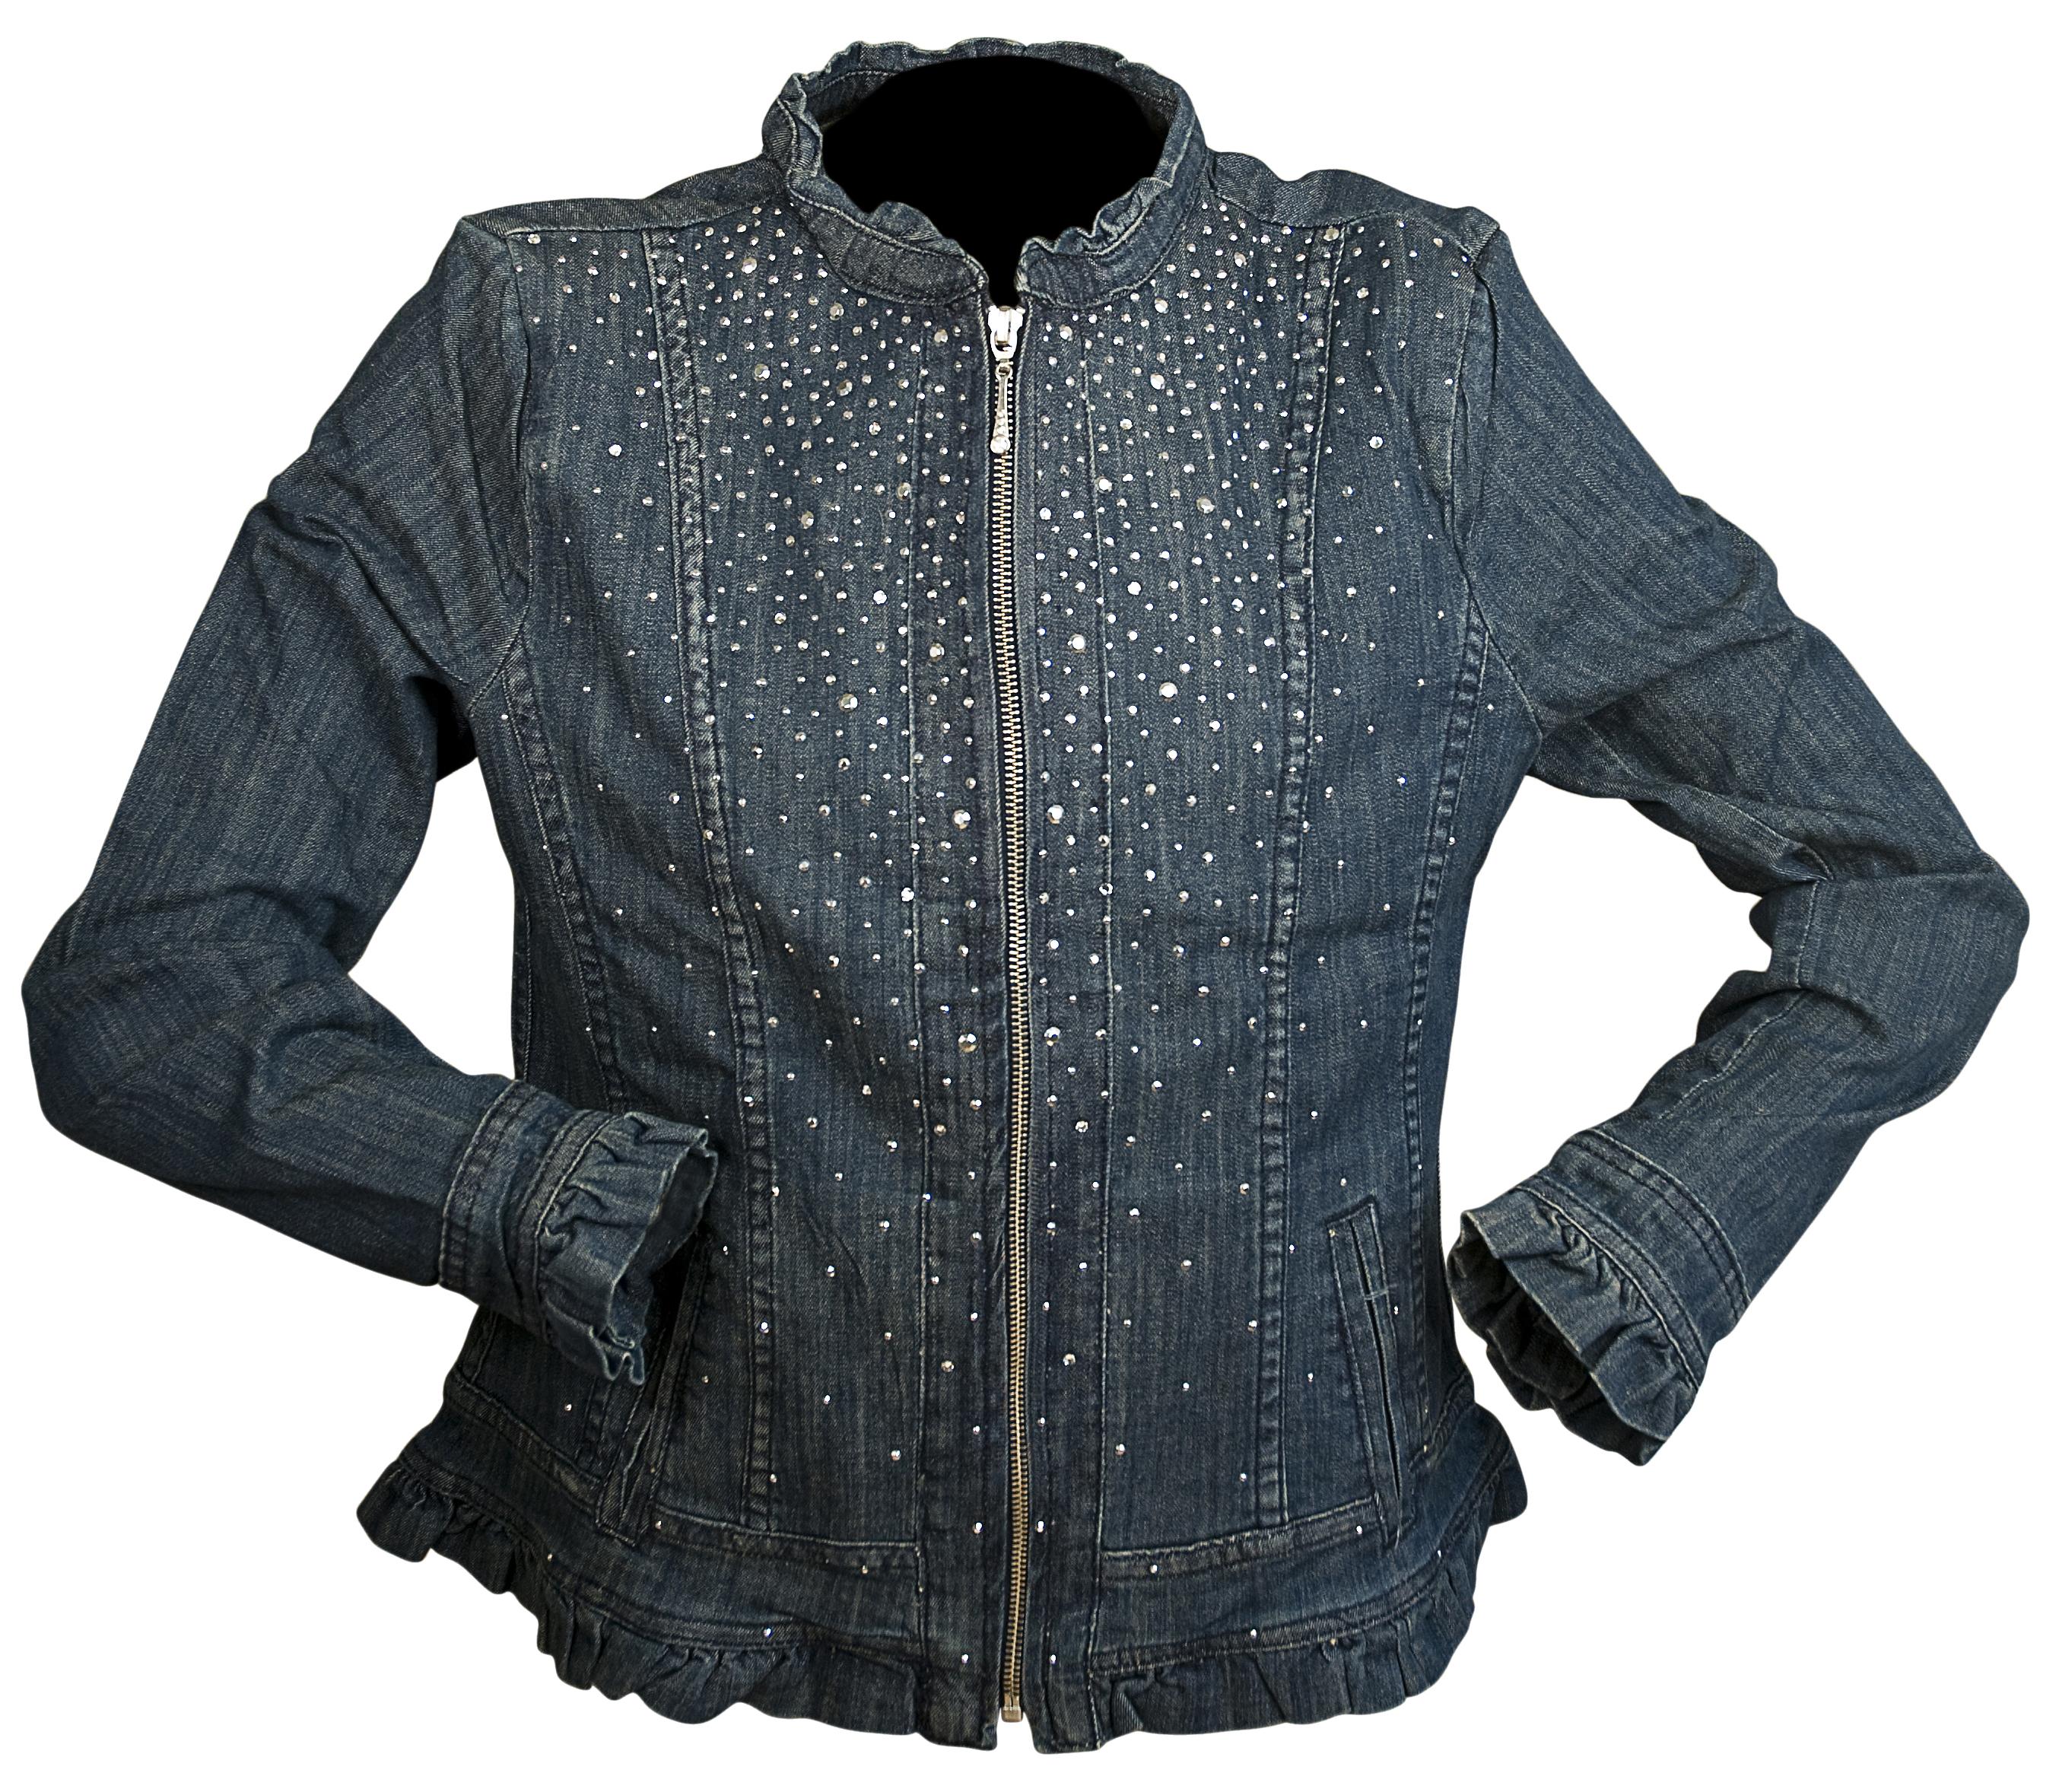 Christine Alexander Denim Ruffle Trim Jacket with Crystals